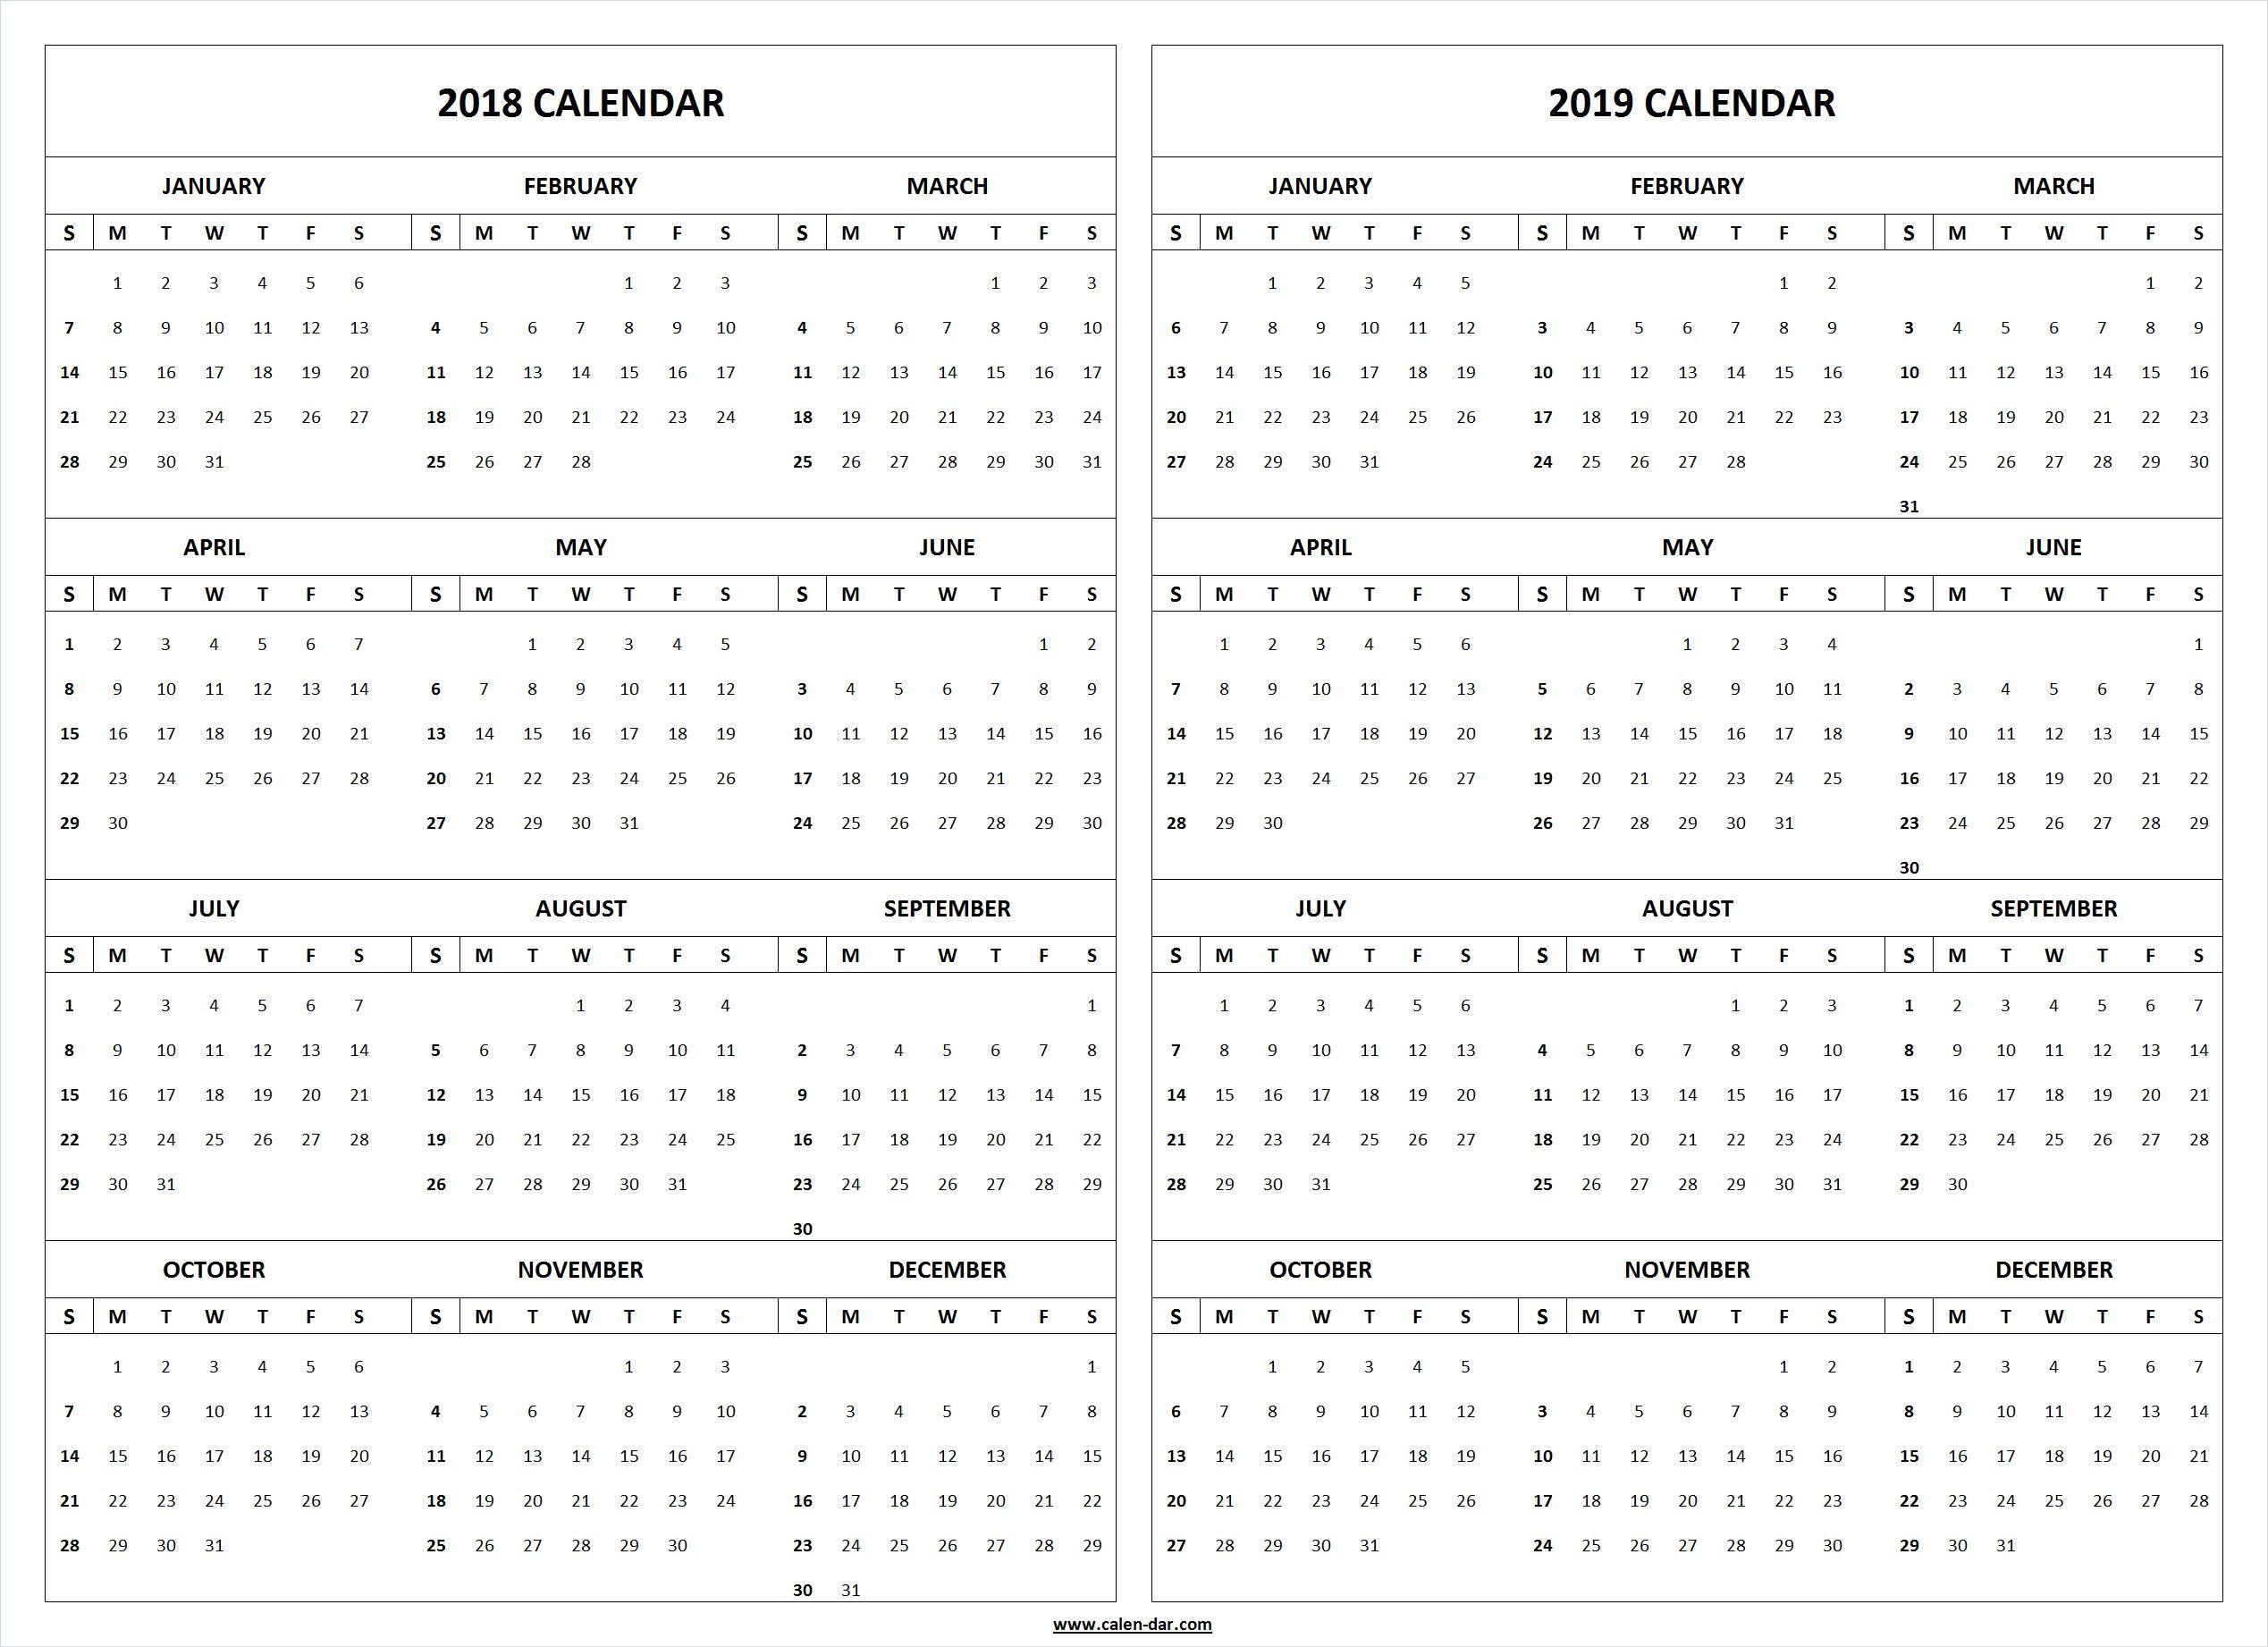 2018 2019 Calendar | Yearly Calendar | Pinterest | Yearly calendar ...